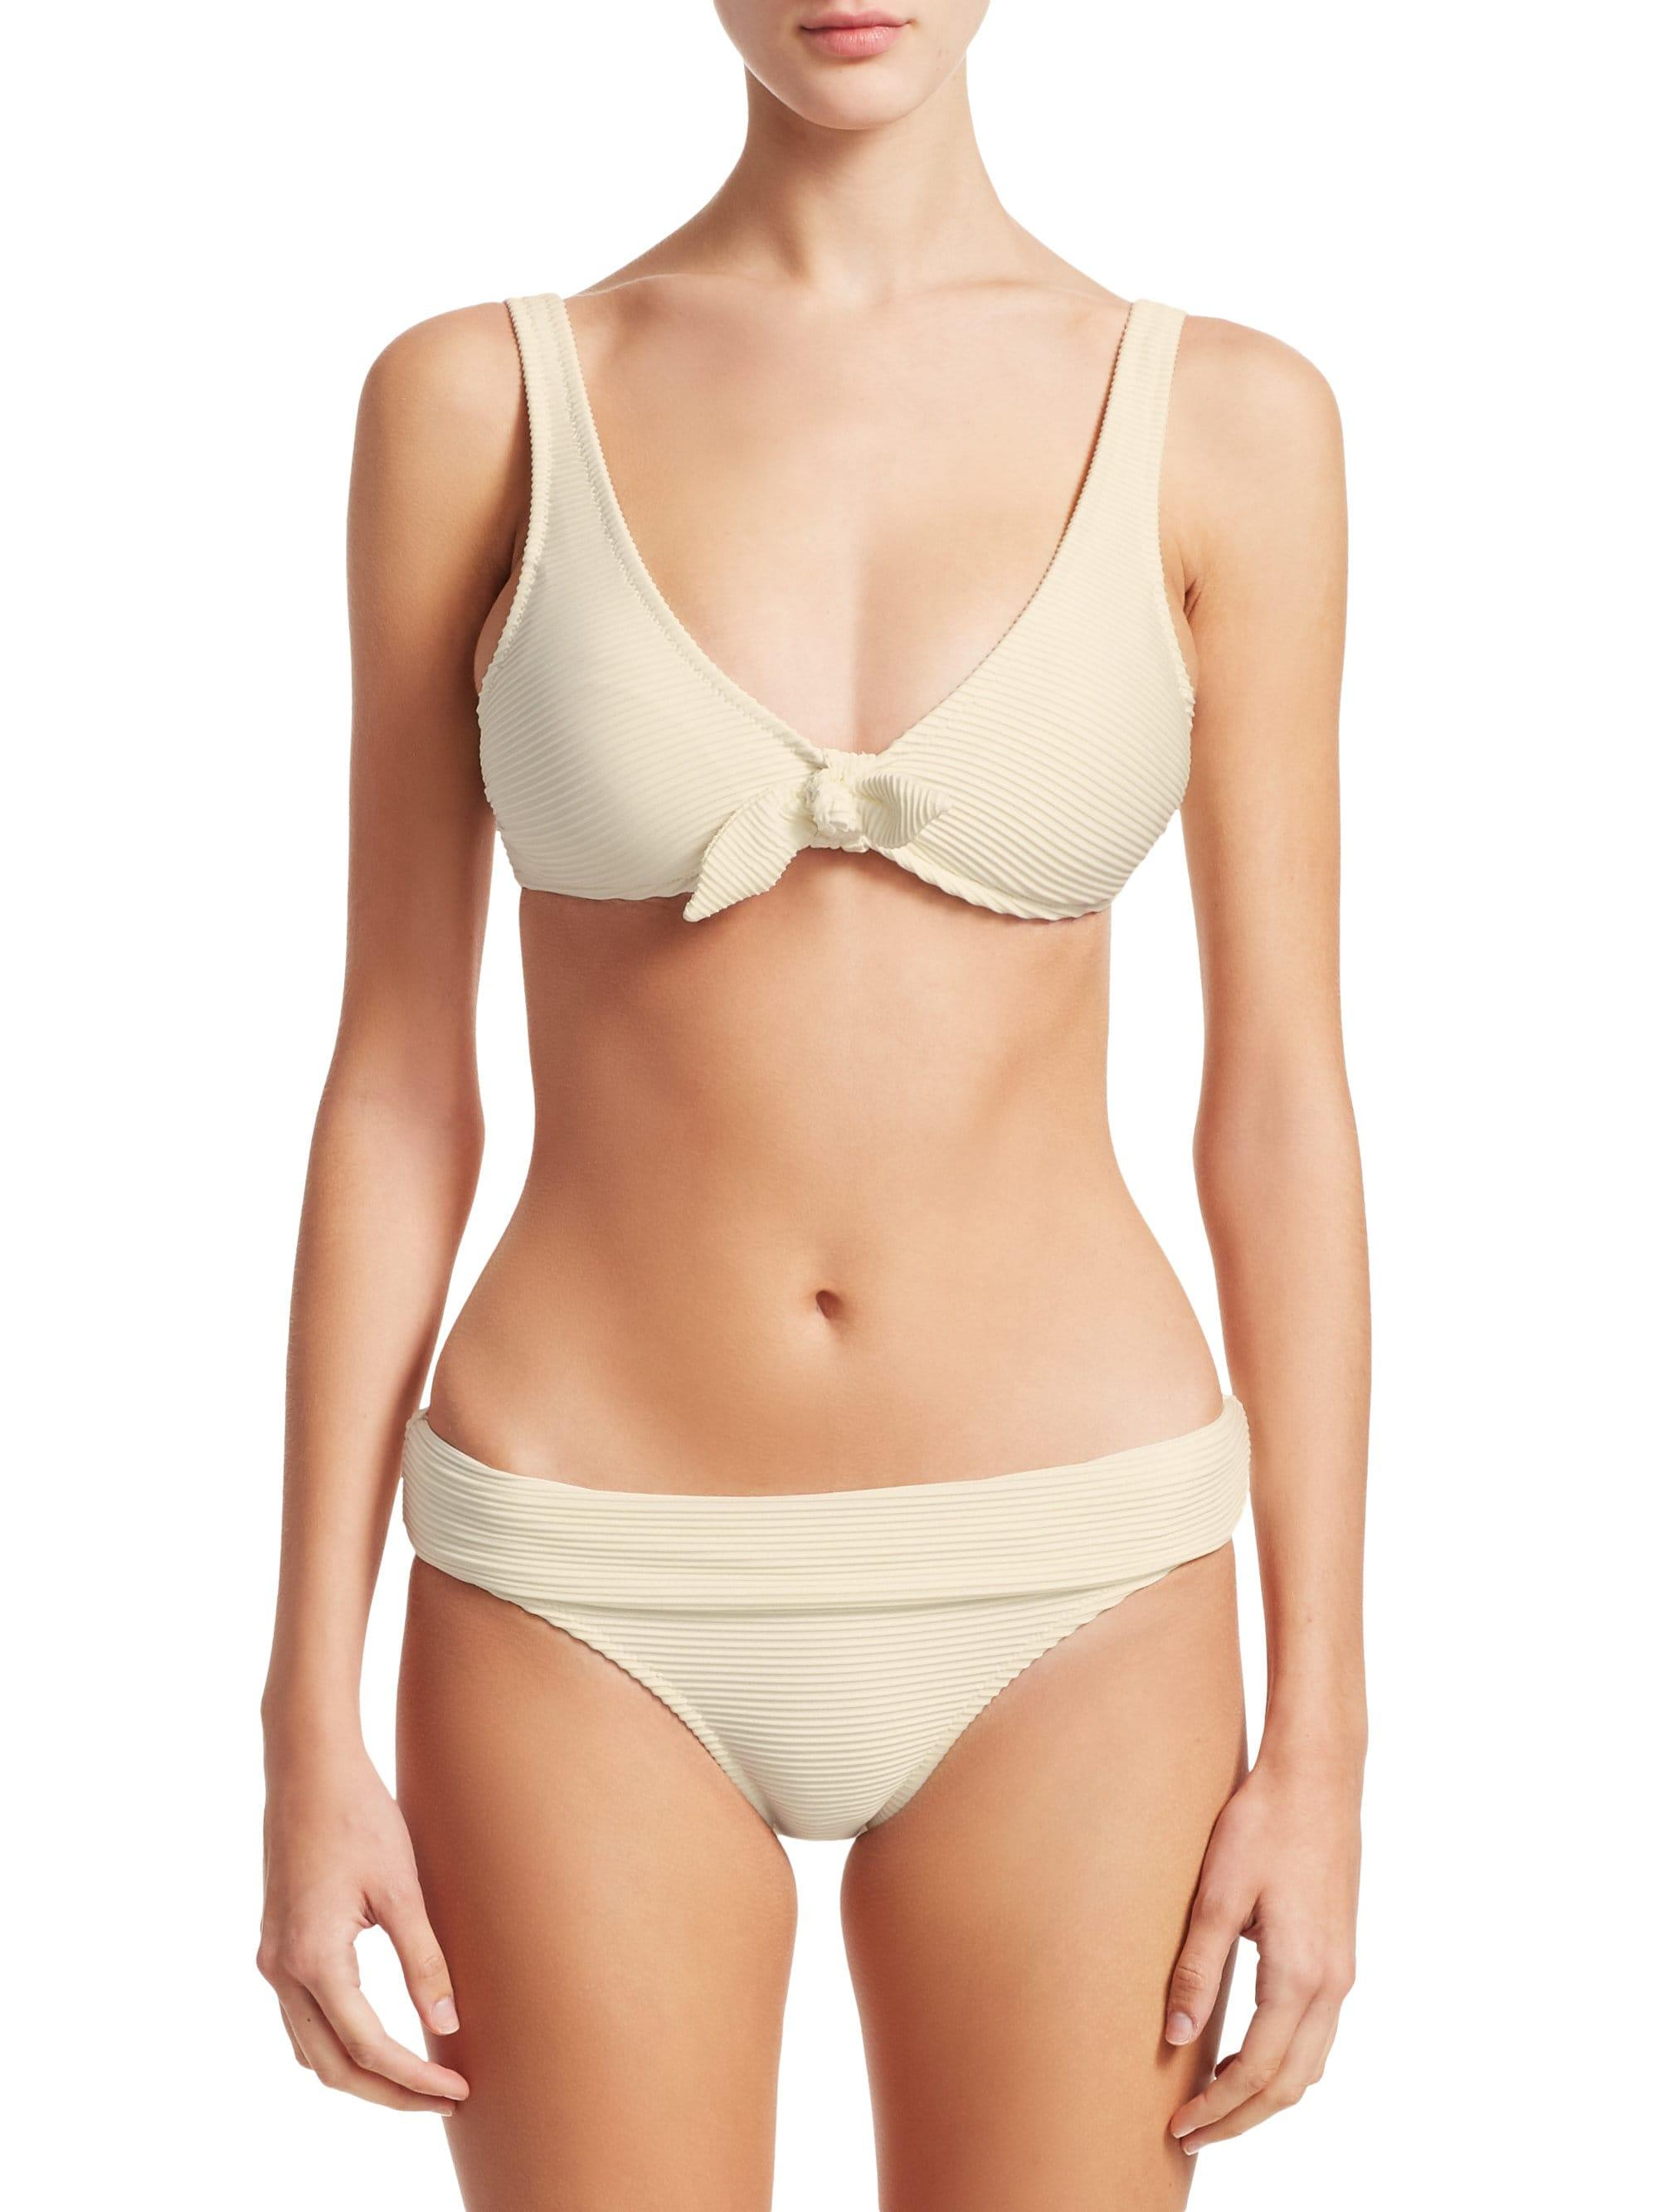 54070ccc54f5f Lyst - Heidi Klein Women s Cote D-azur Knot-front Bikini Top - White ...